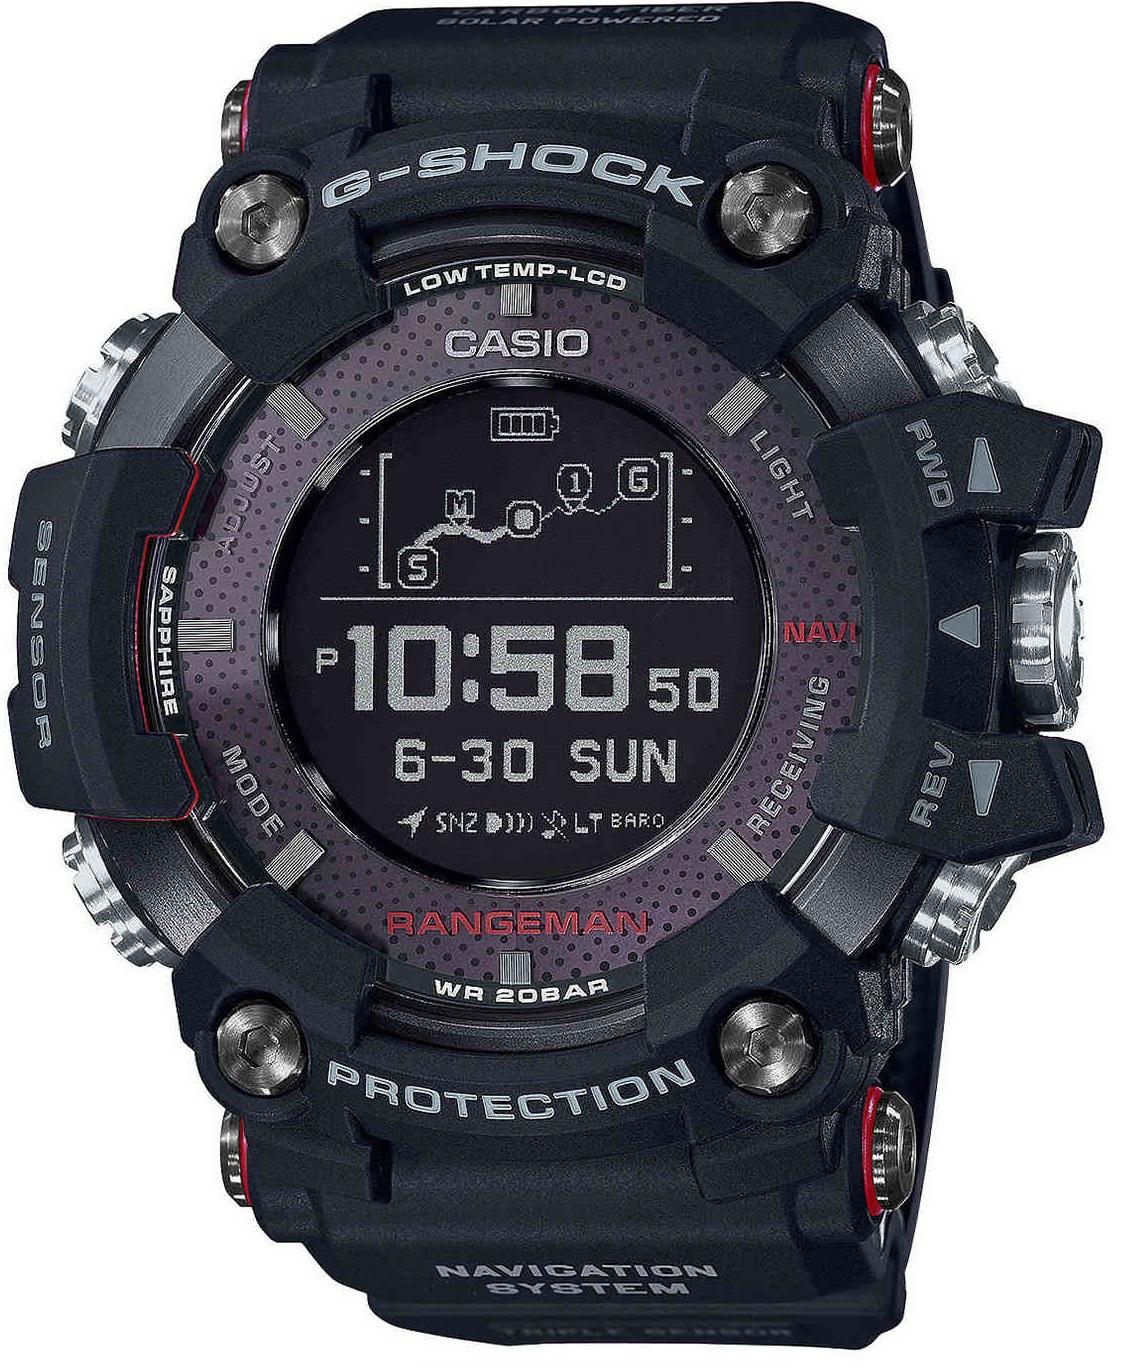 Мужские часы Casio G-Shock GPR-B1000-1ER